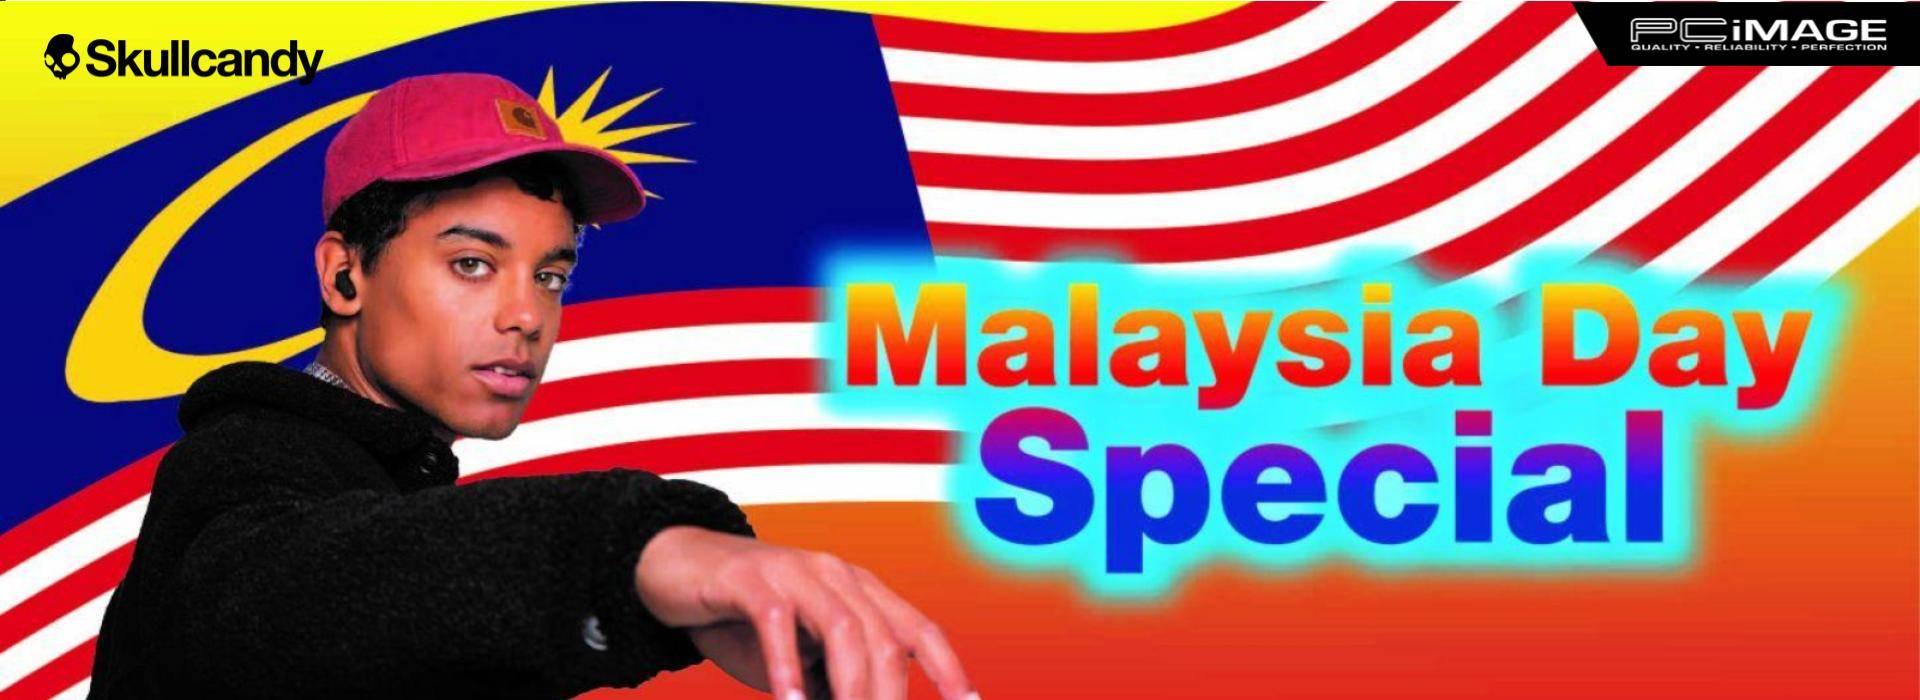 Skullcandy Malaysia Day 26 Sep